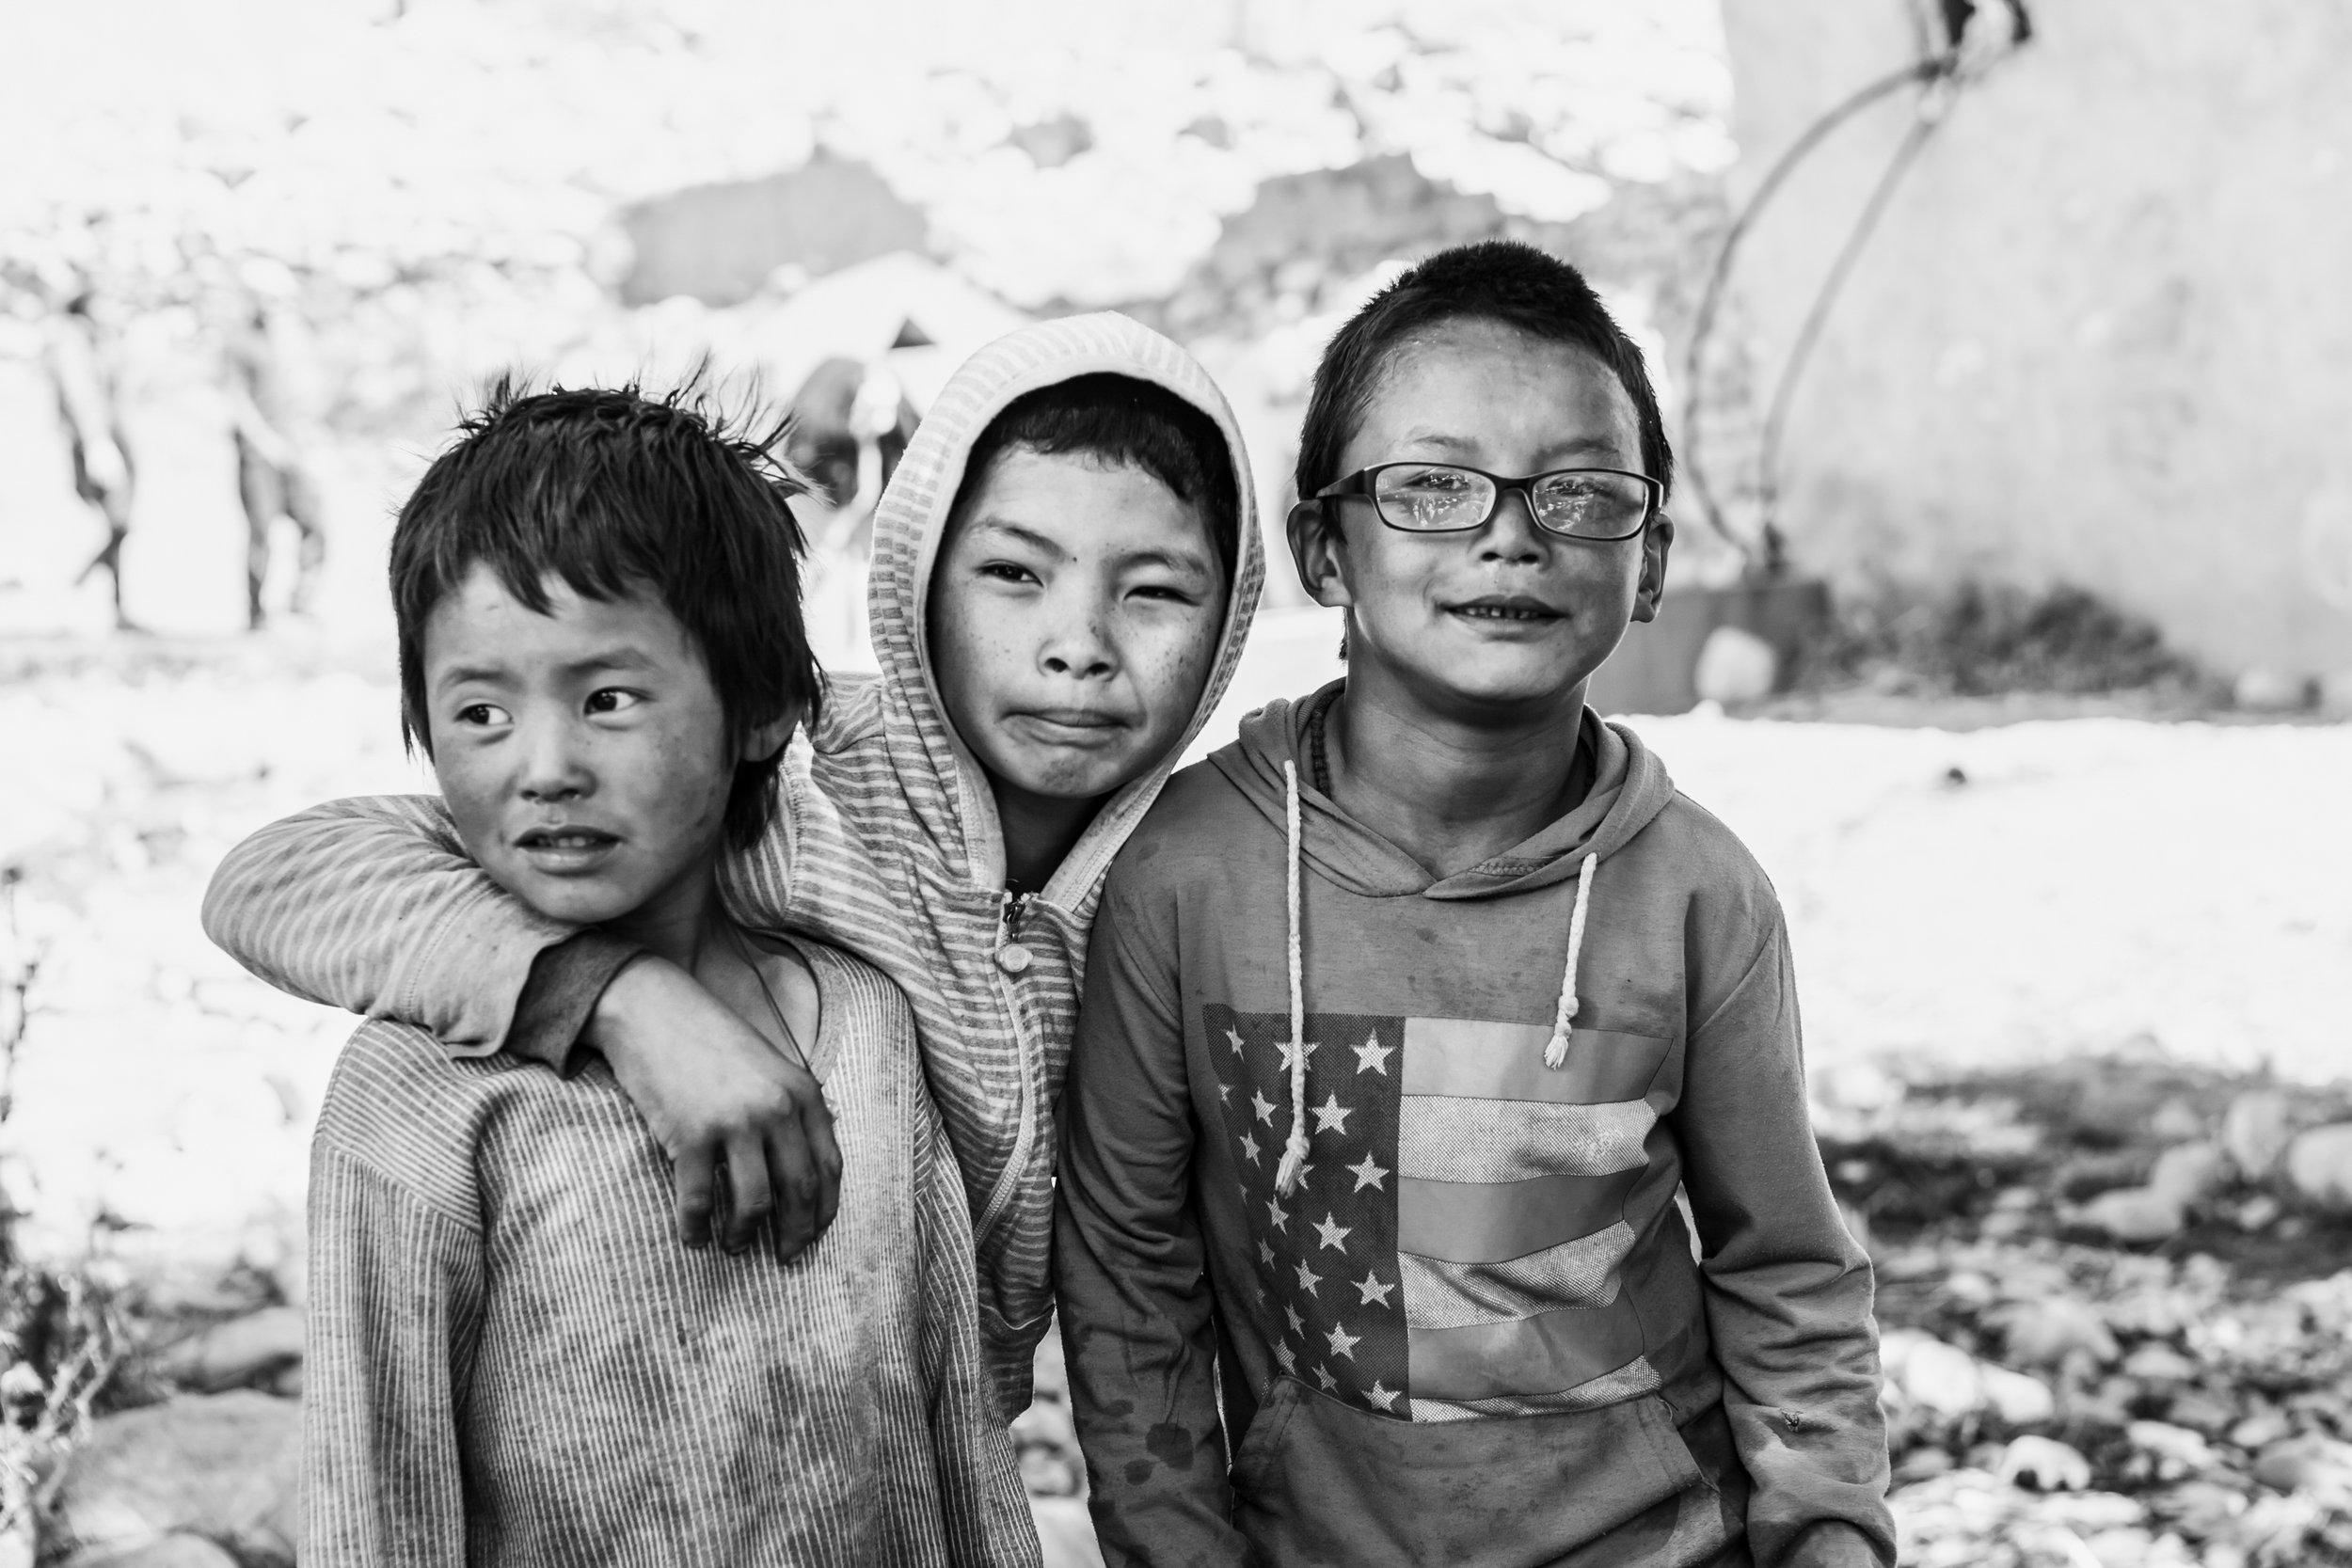 TWHMC-nepal-motorcycle-adventure-2016-1147-2.jpg